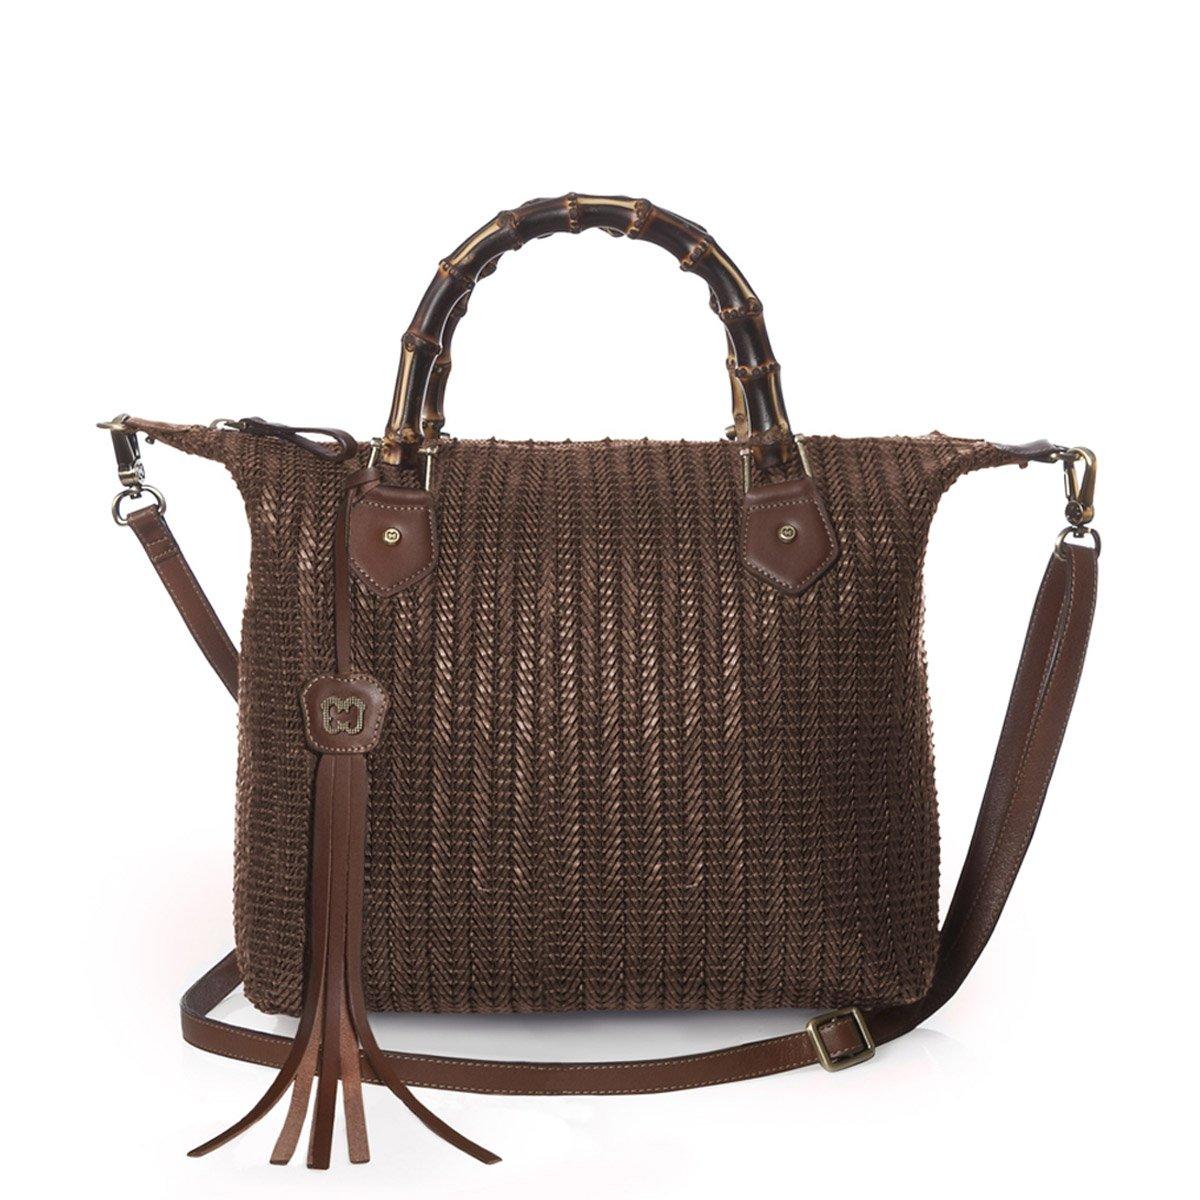 Eric Javits Luxury Fashion Designer Women's Handbag - Hilsey - Caper